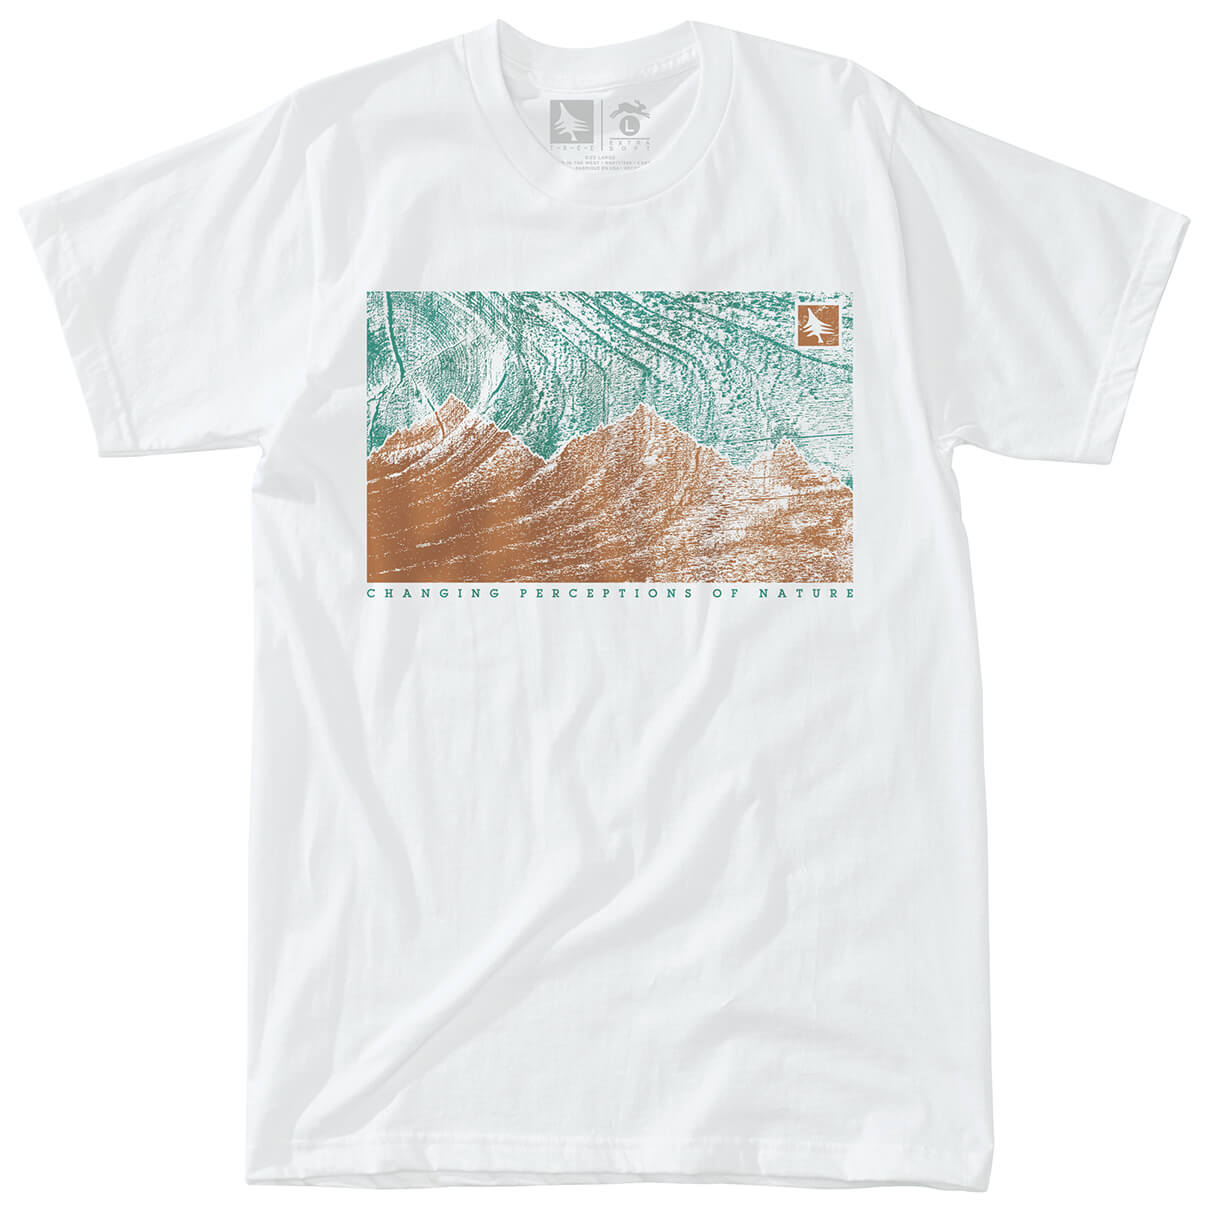 Hippy tree woodcrest tee t shirt homme achat en ligne for Hippie t shirts australia